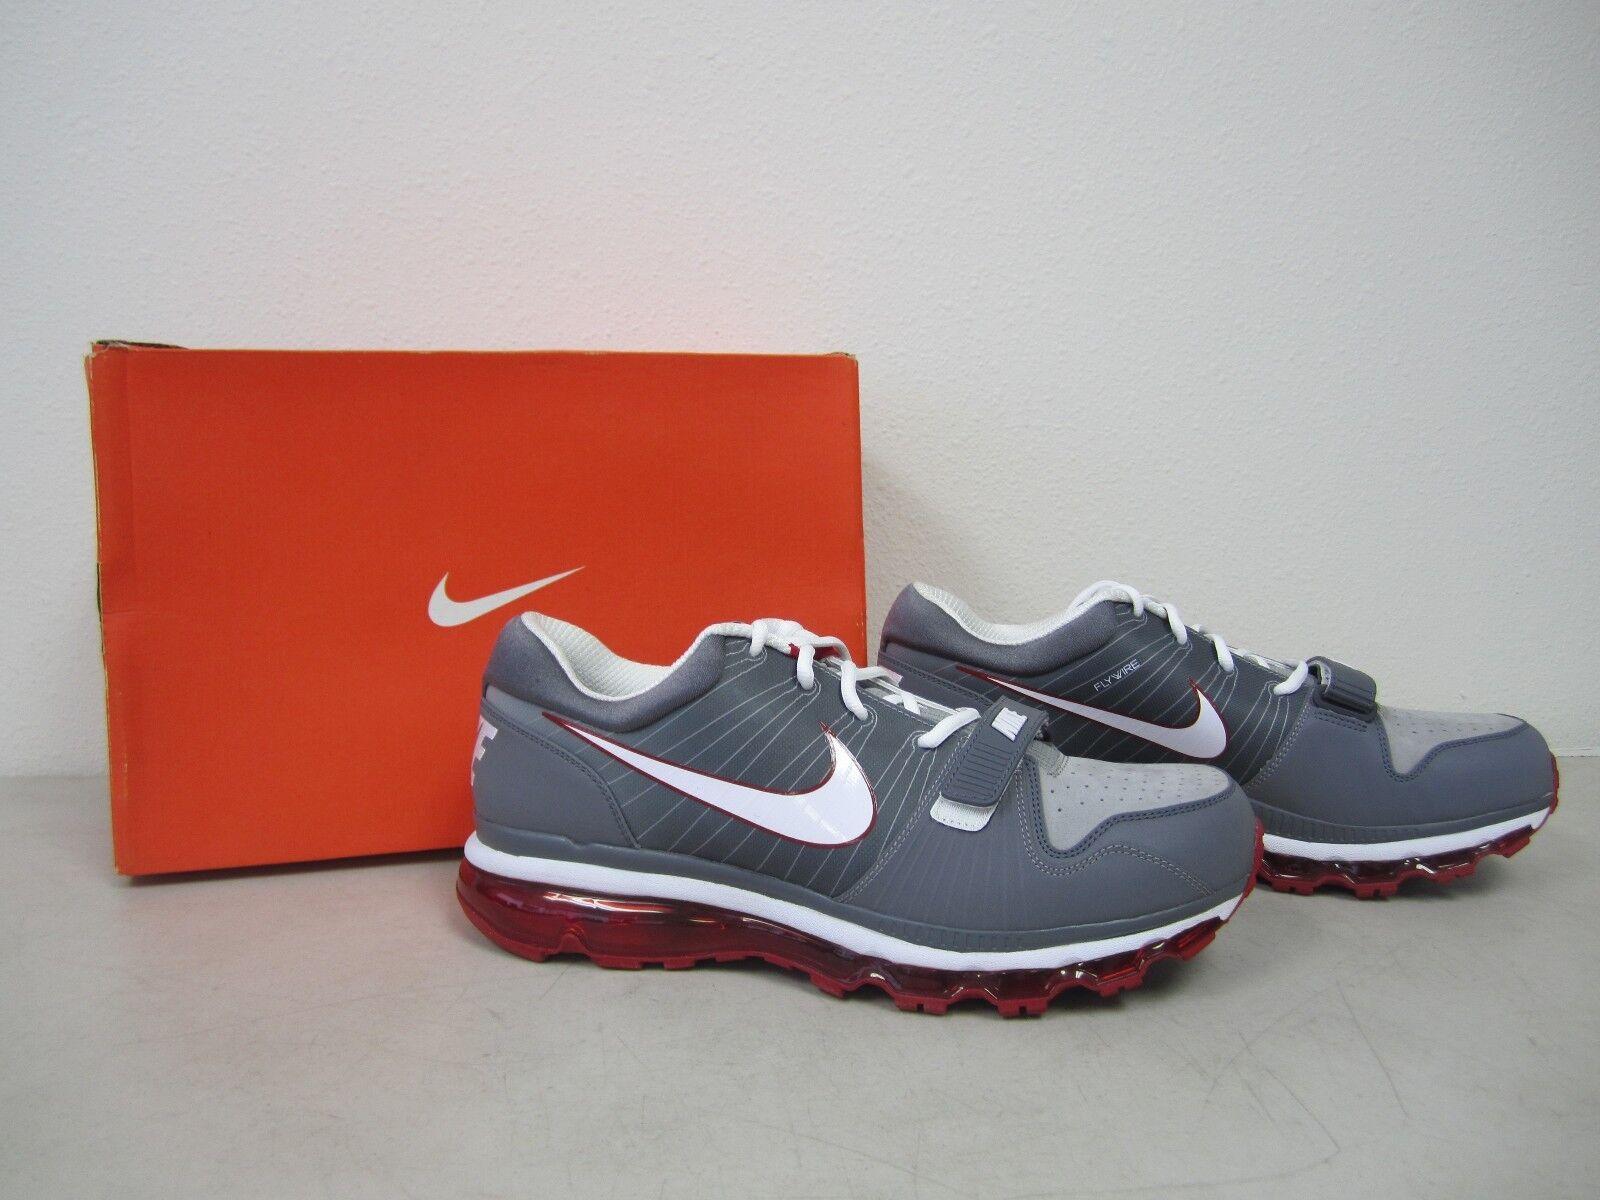 Uomo Nike Trainer 1 Low Shoes - Graphite/Grey/White - Size 12.5 - Promo Sample